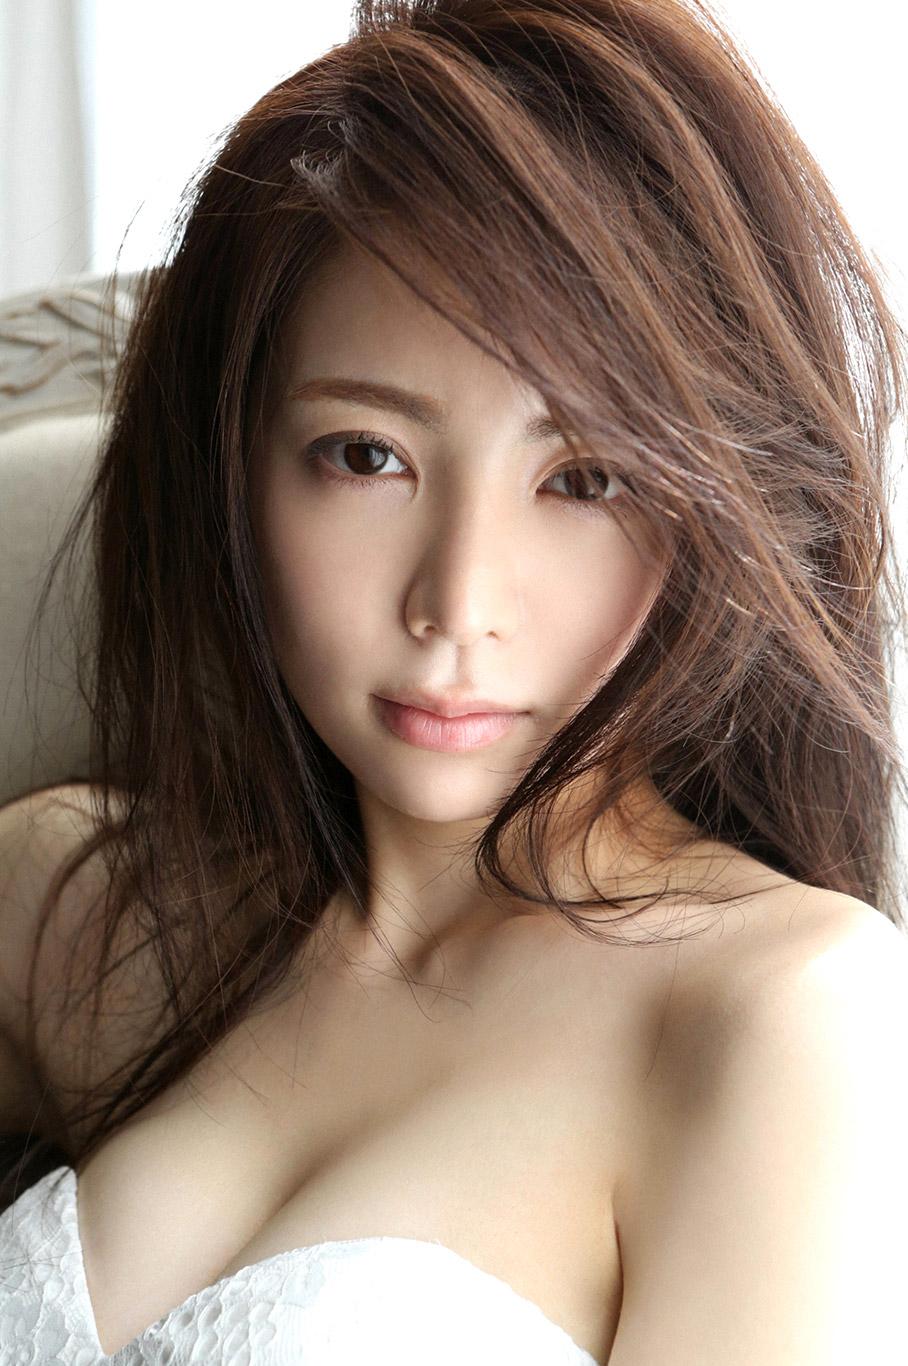 Mature softcore nudes